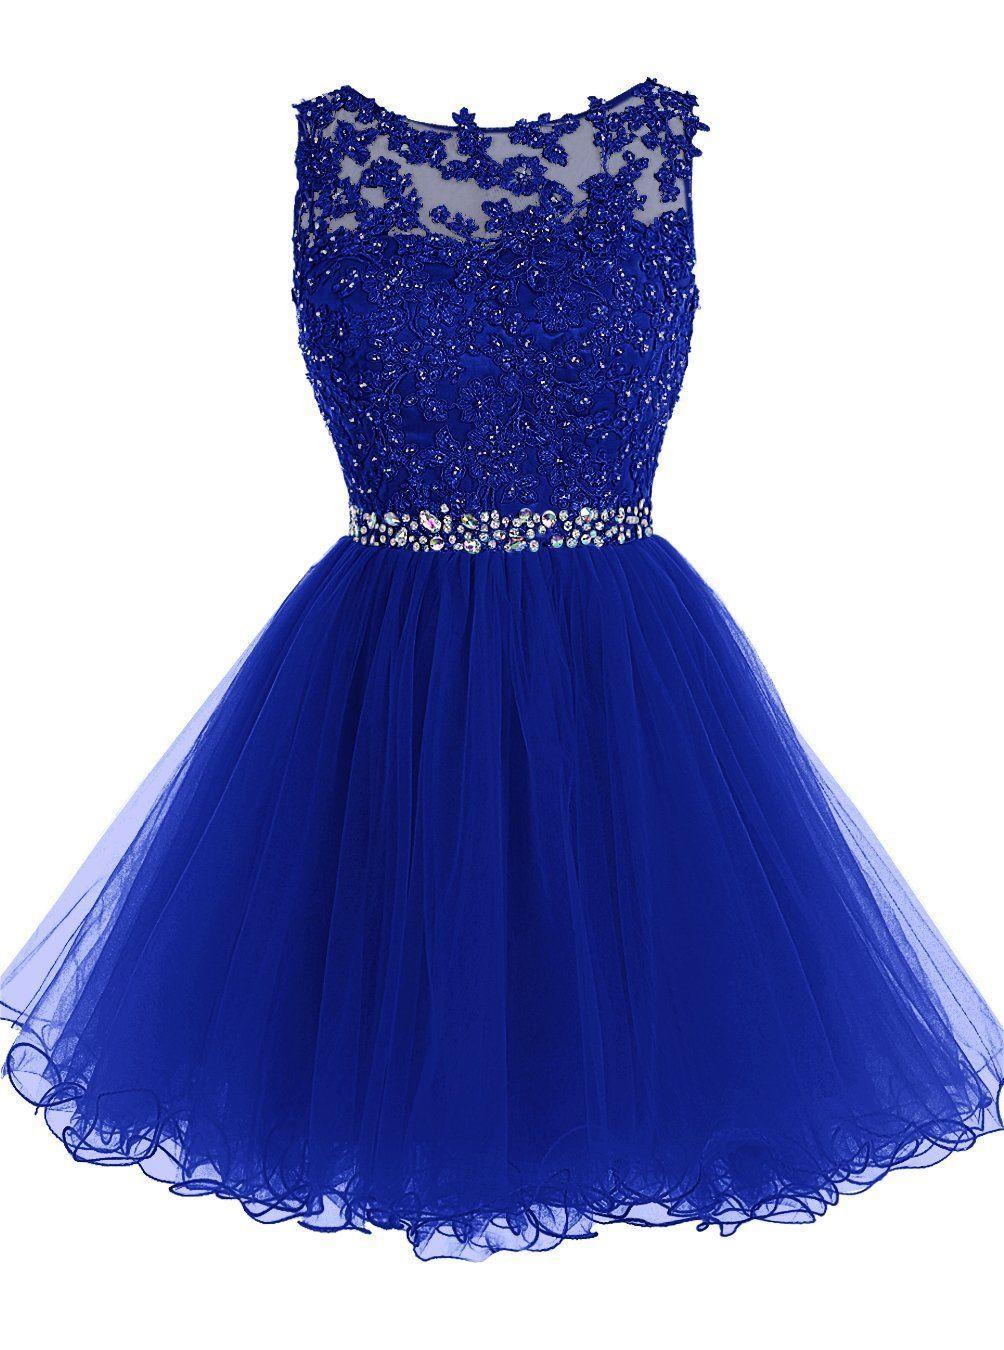 blue dresses royal blue PWYRGXV